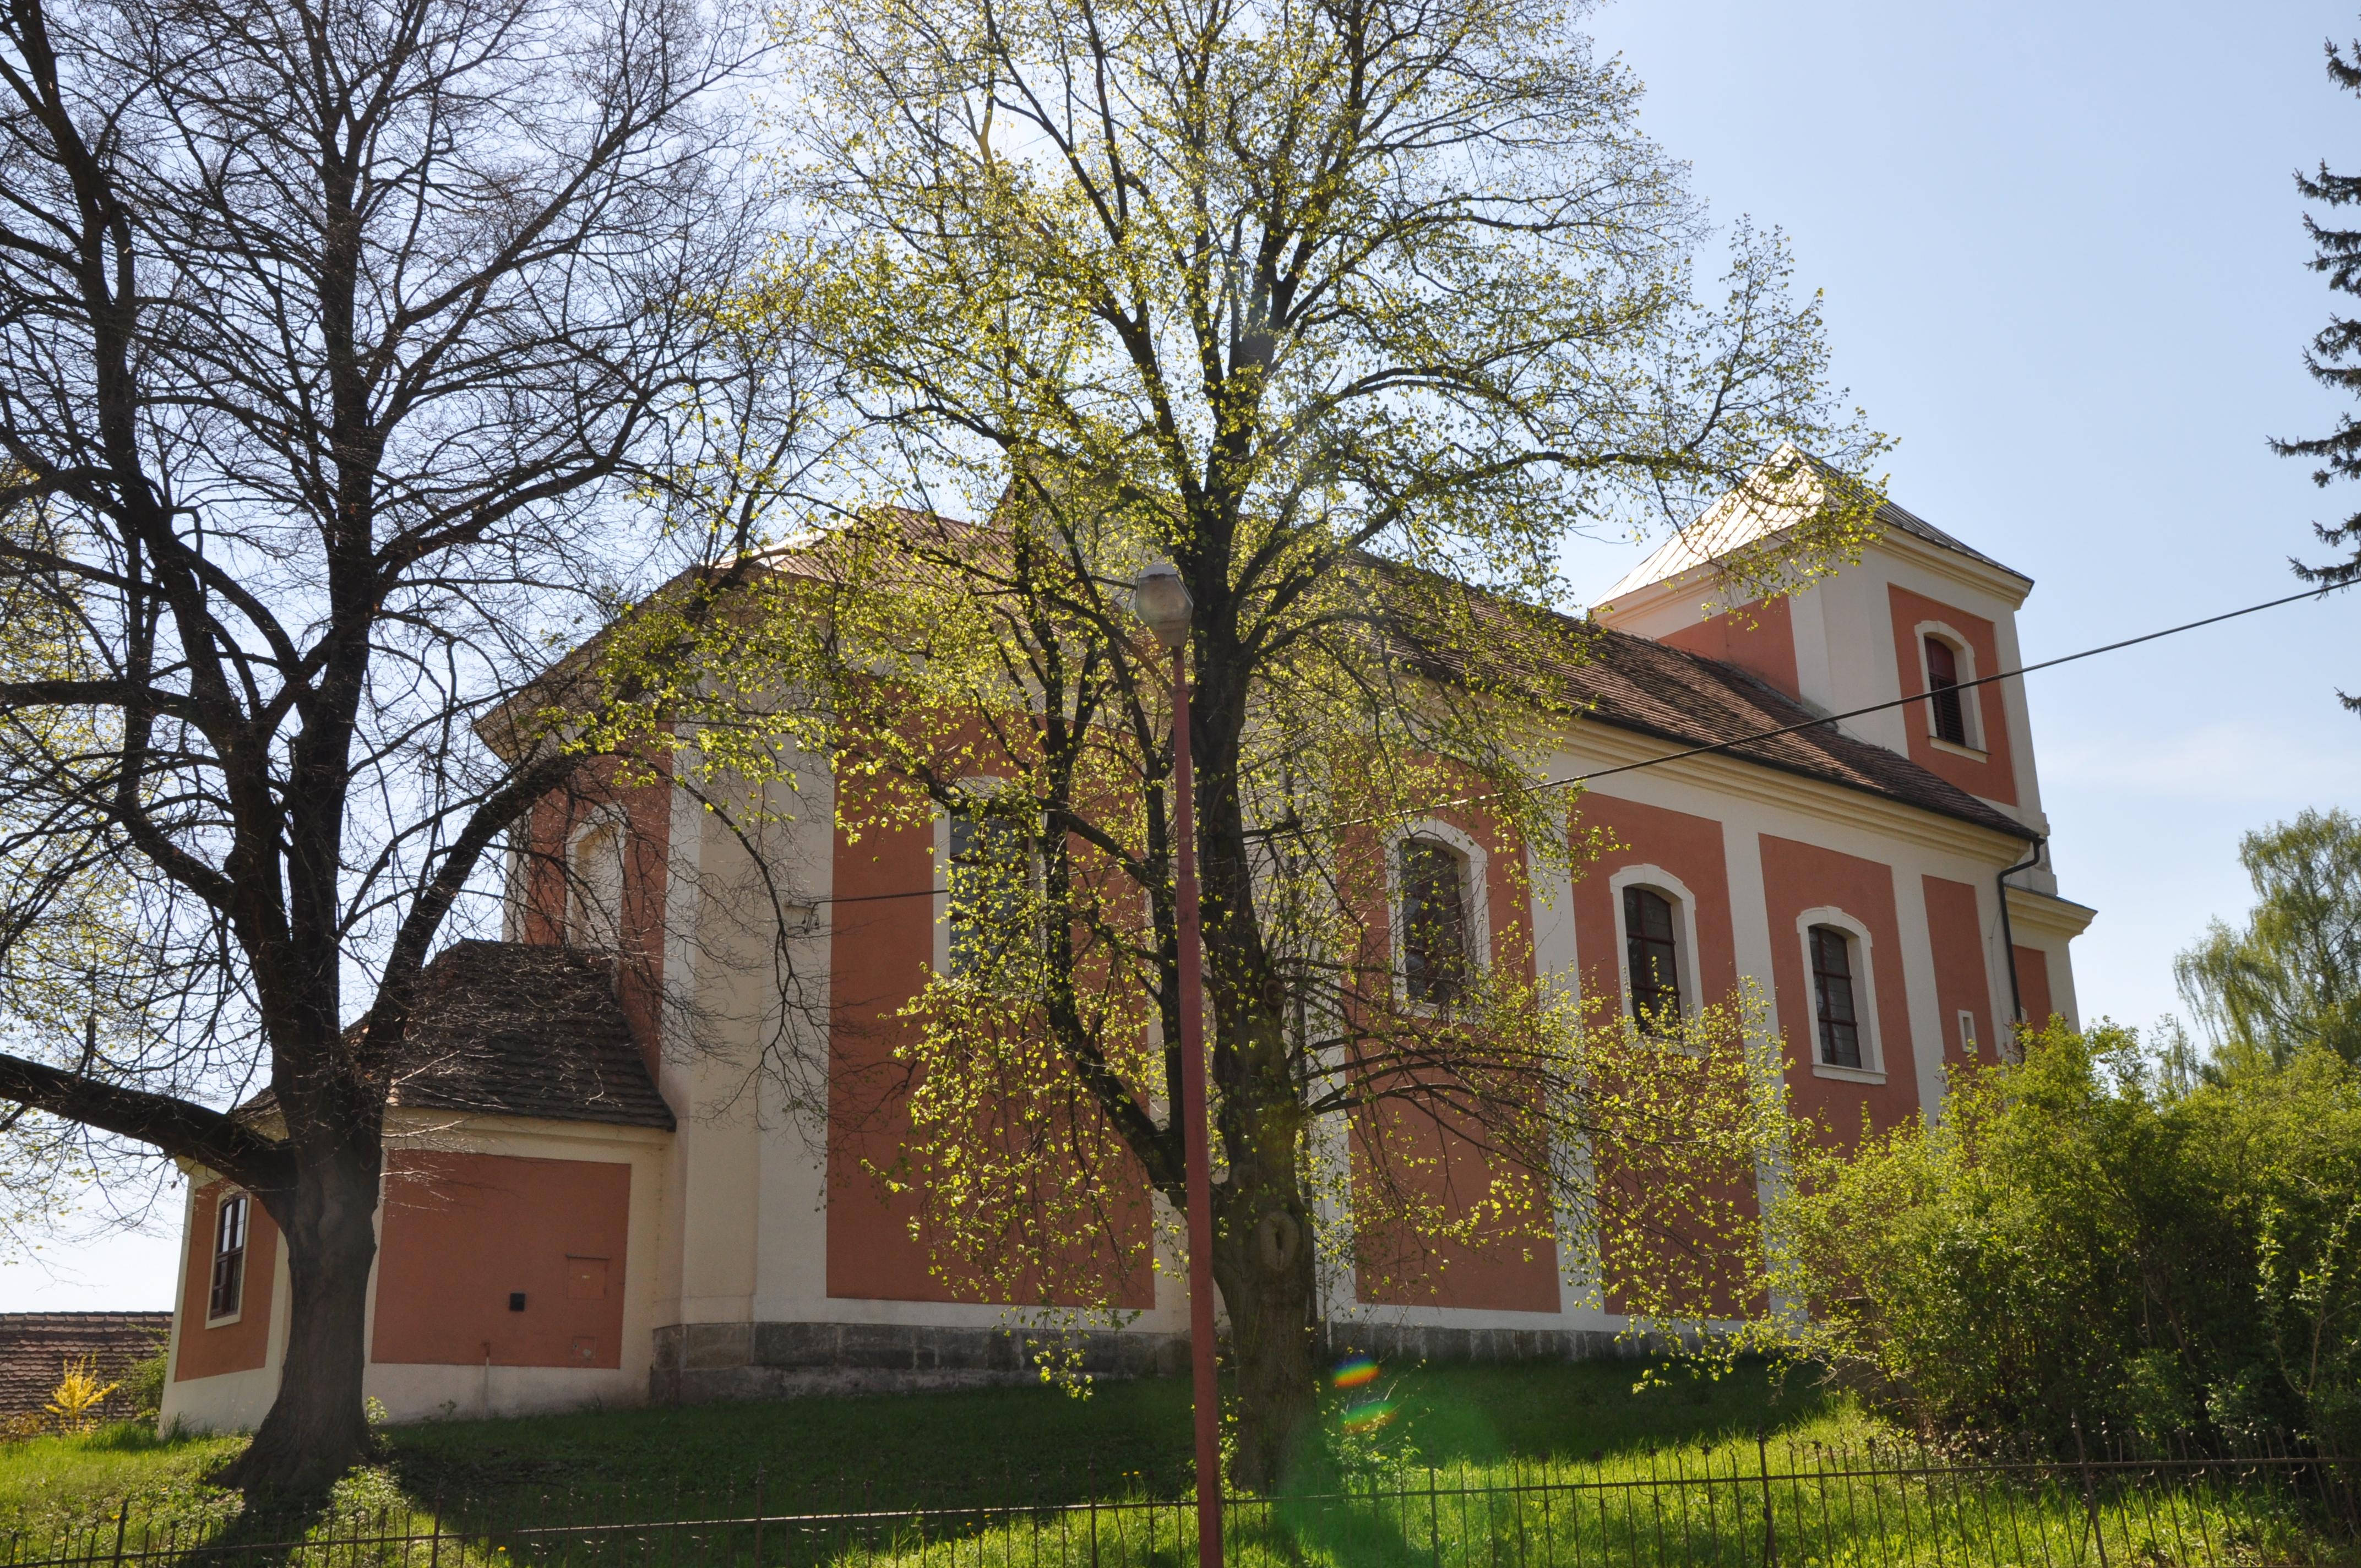 Trojovice